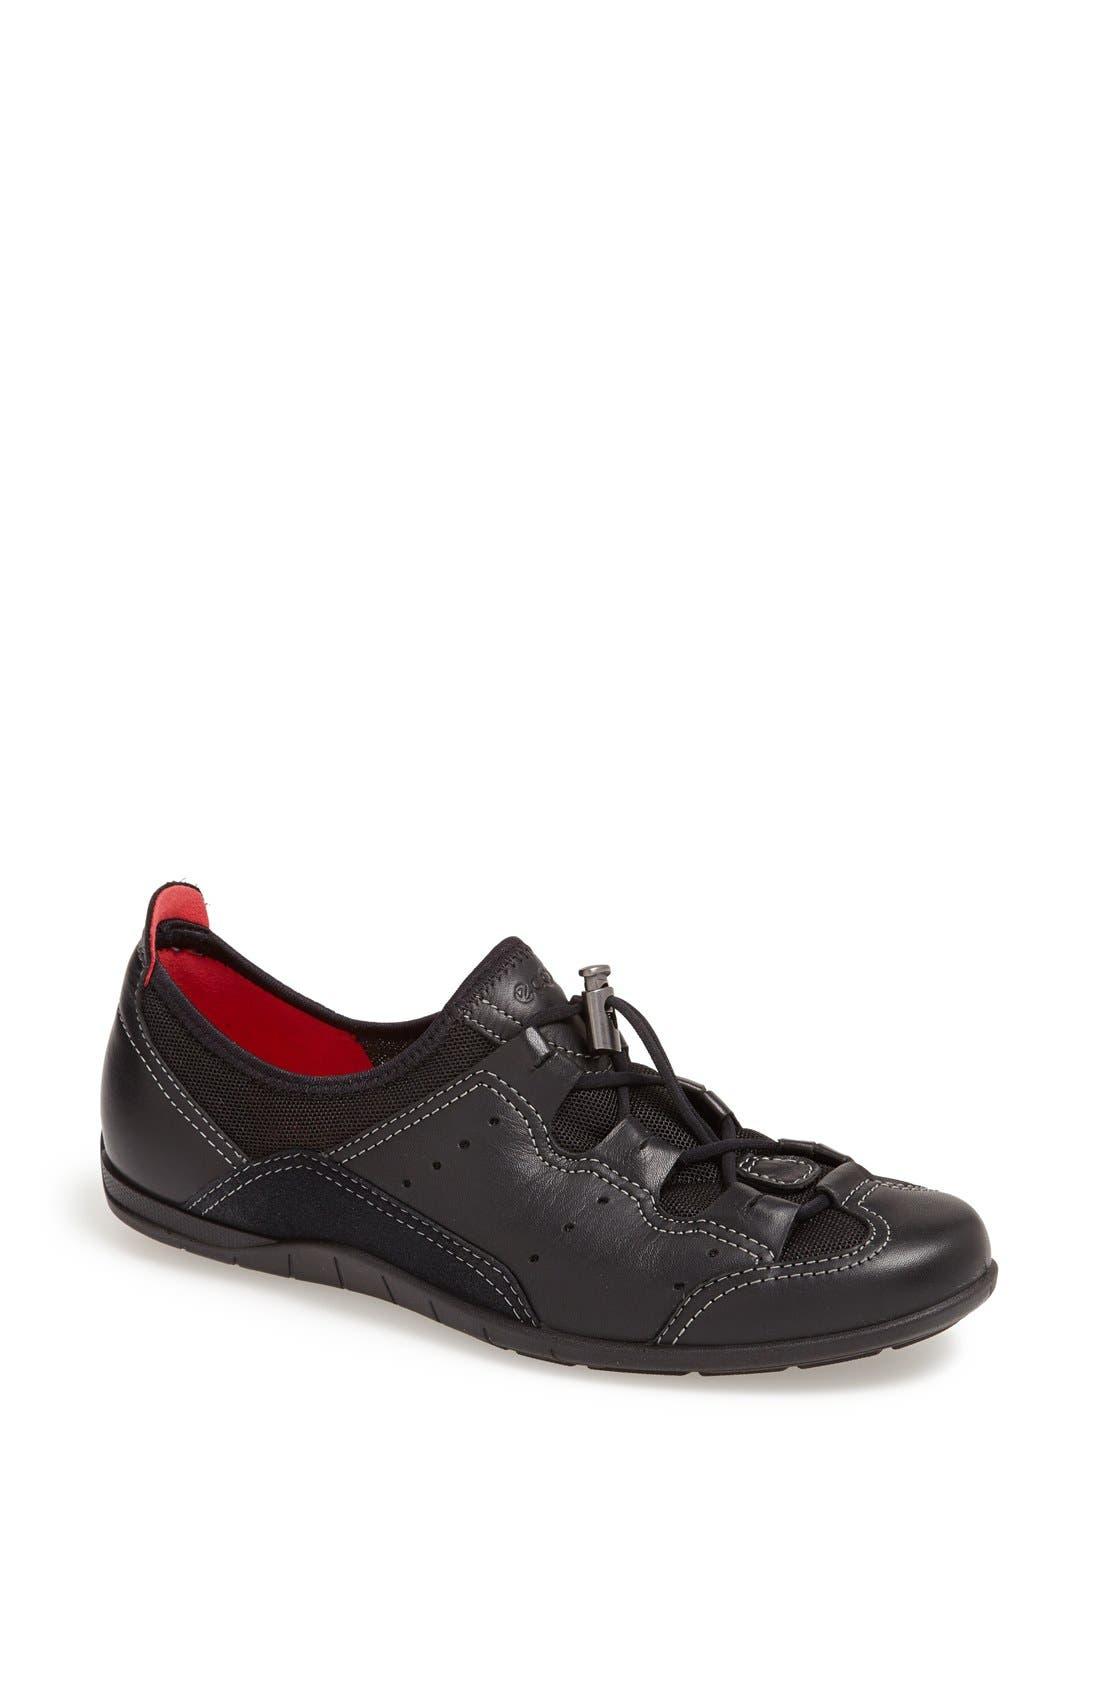 Alternate Image 1 Selected - ECCO 'Bluma' Sneaker (Women)